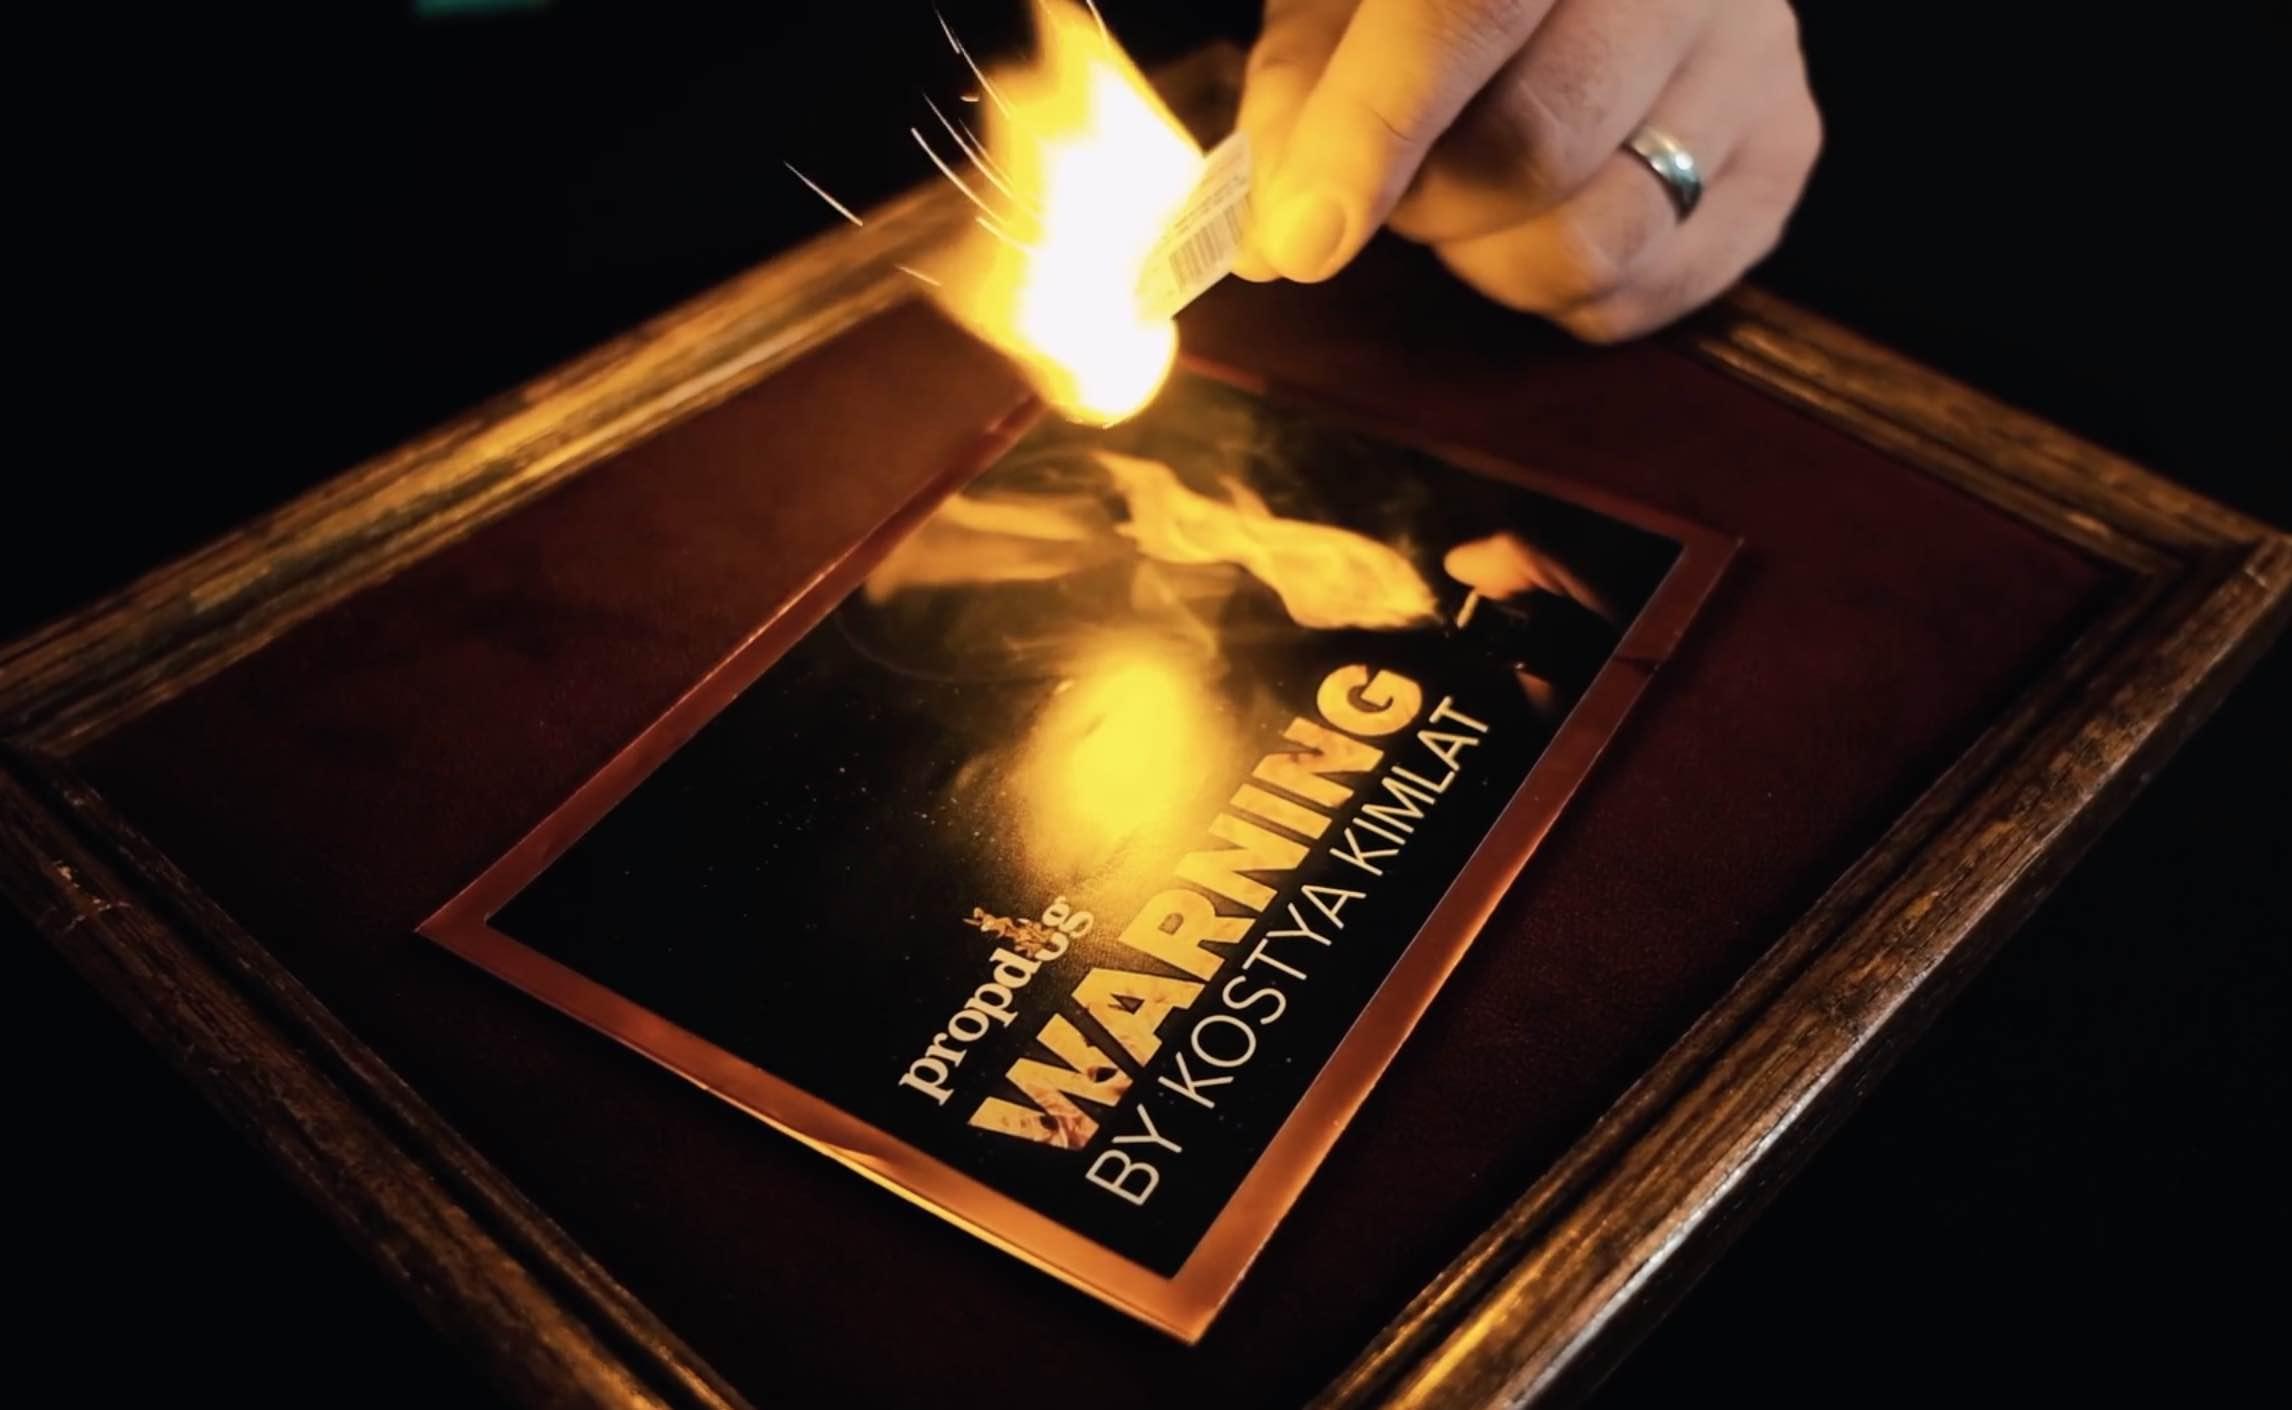 Learn-Magic-Warning-Lighter-Trick-1.jpg